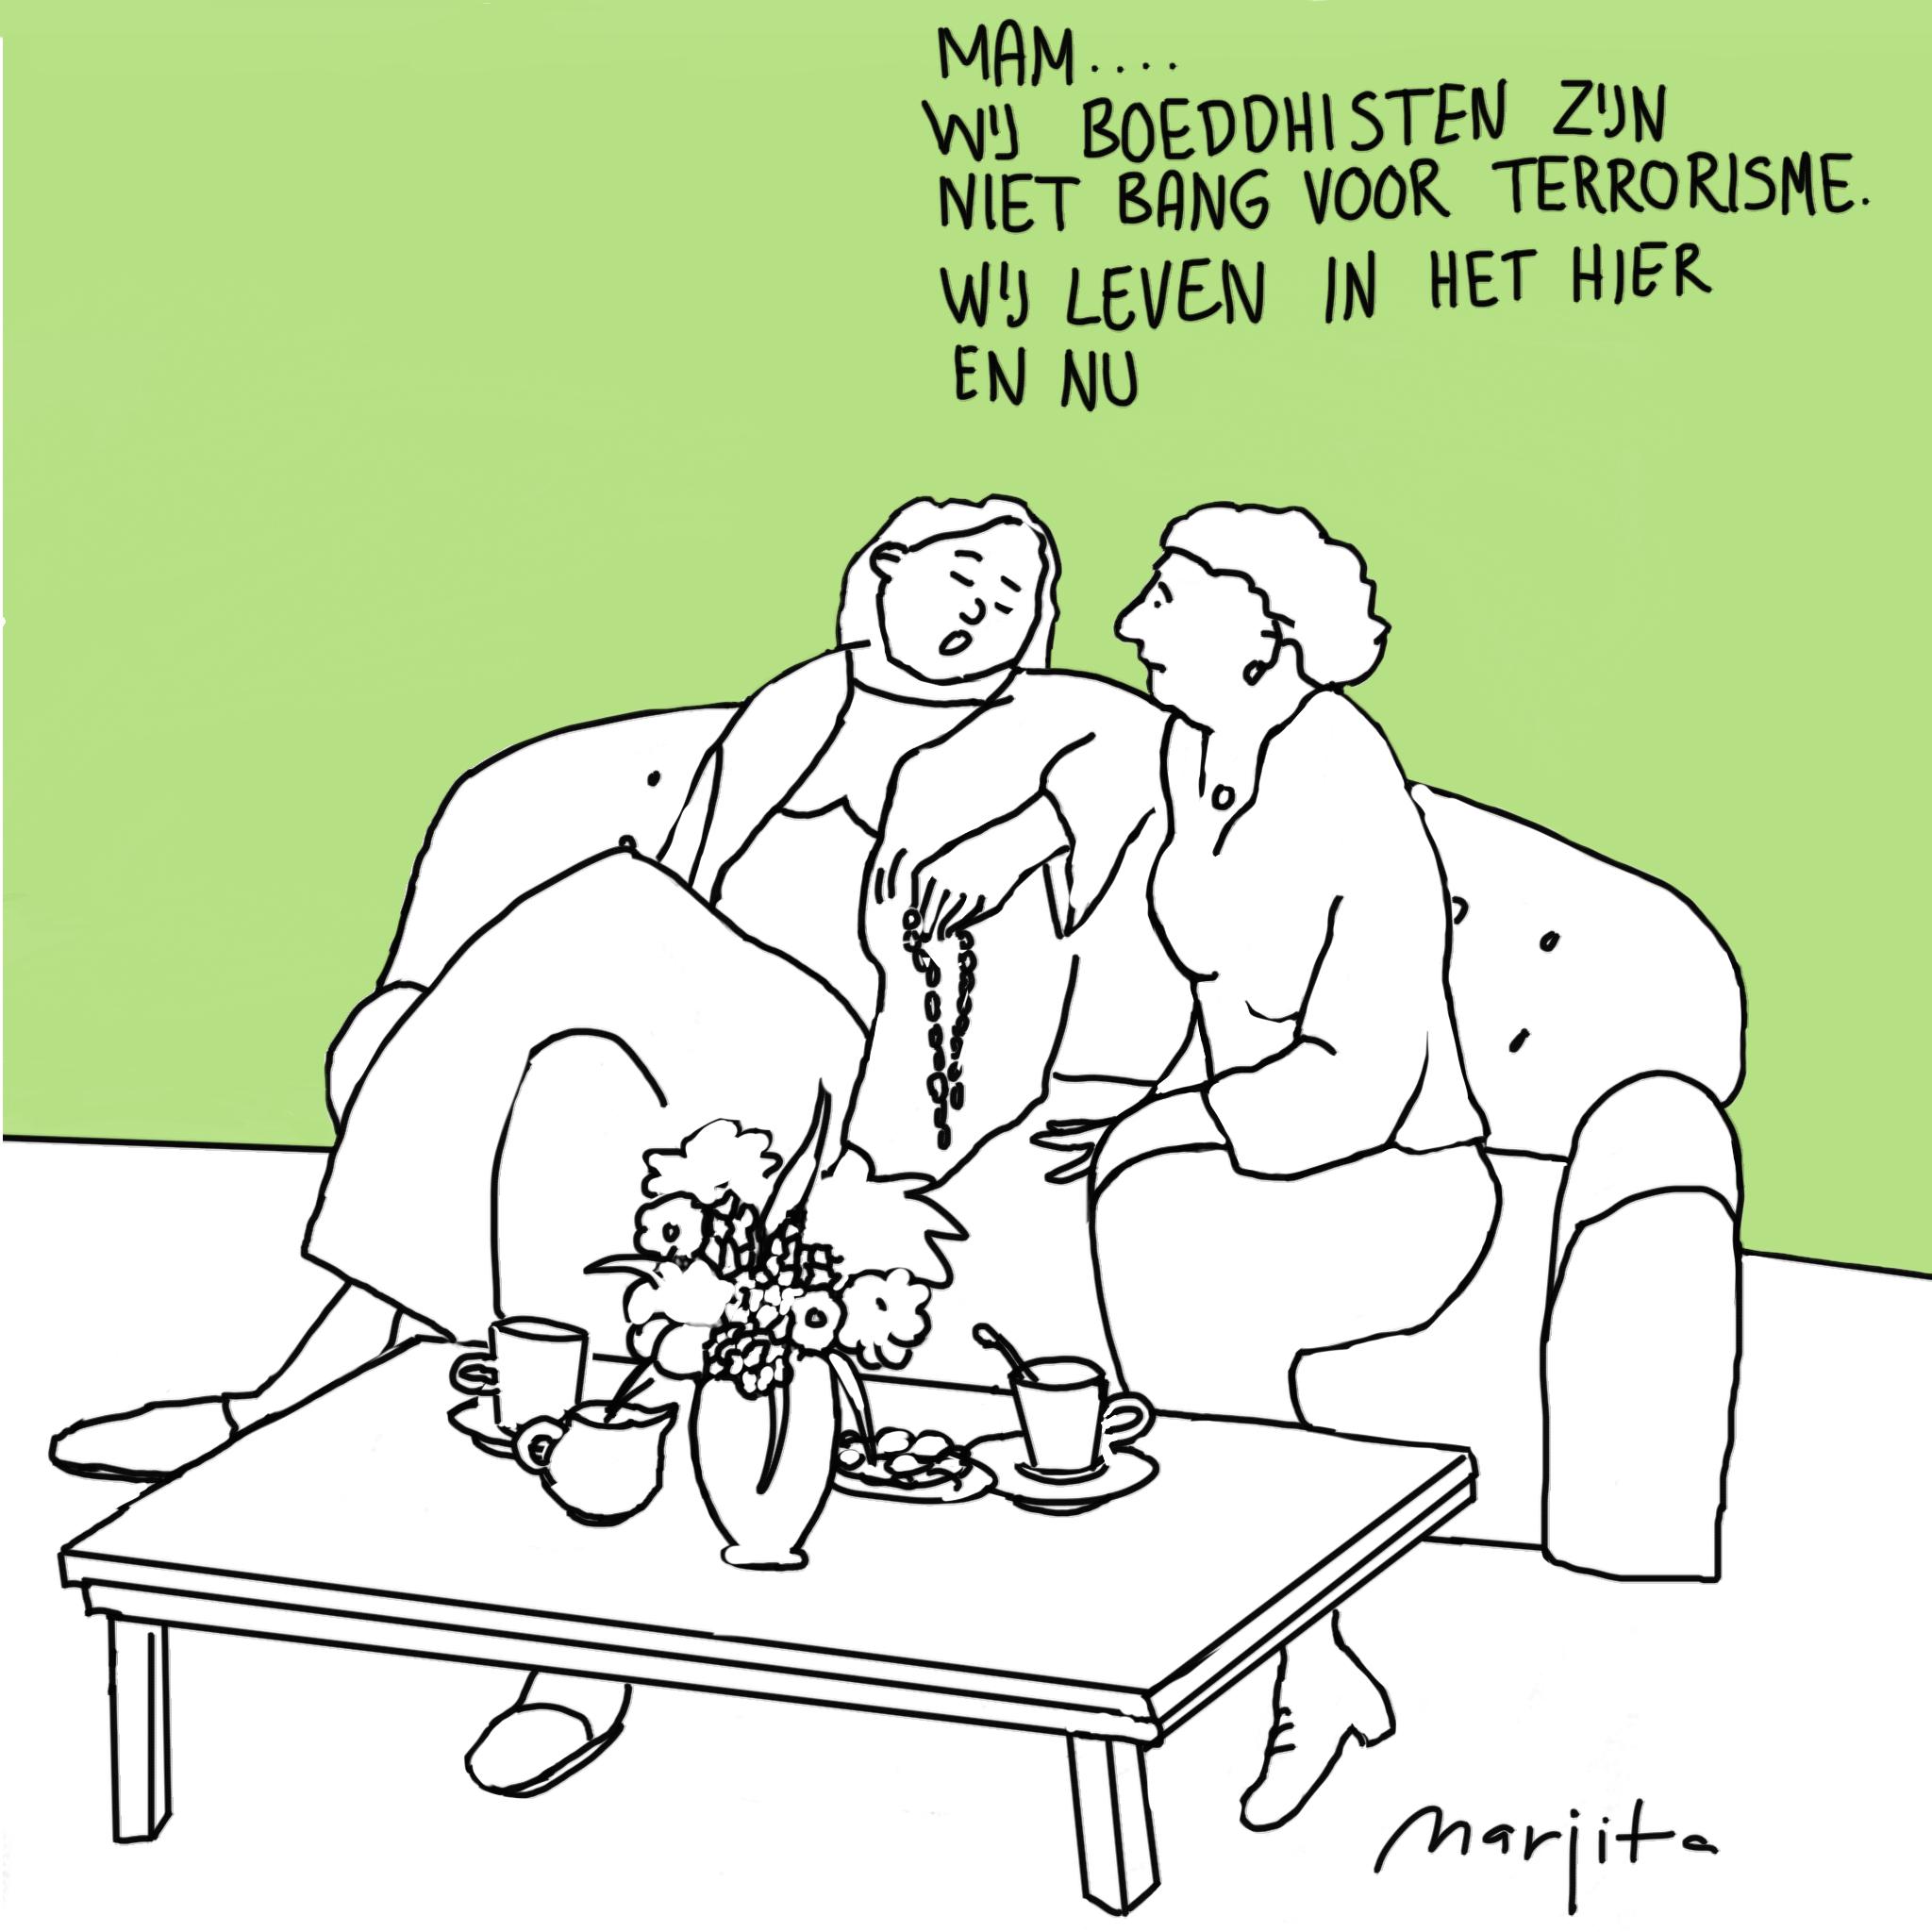 http://marjitatekent.blogspot.nl